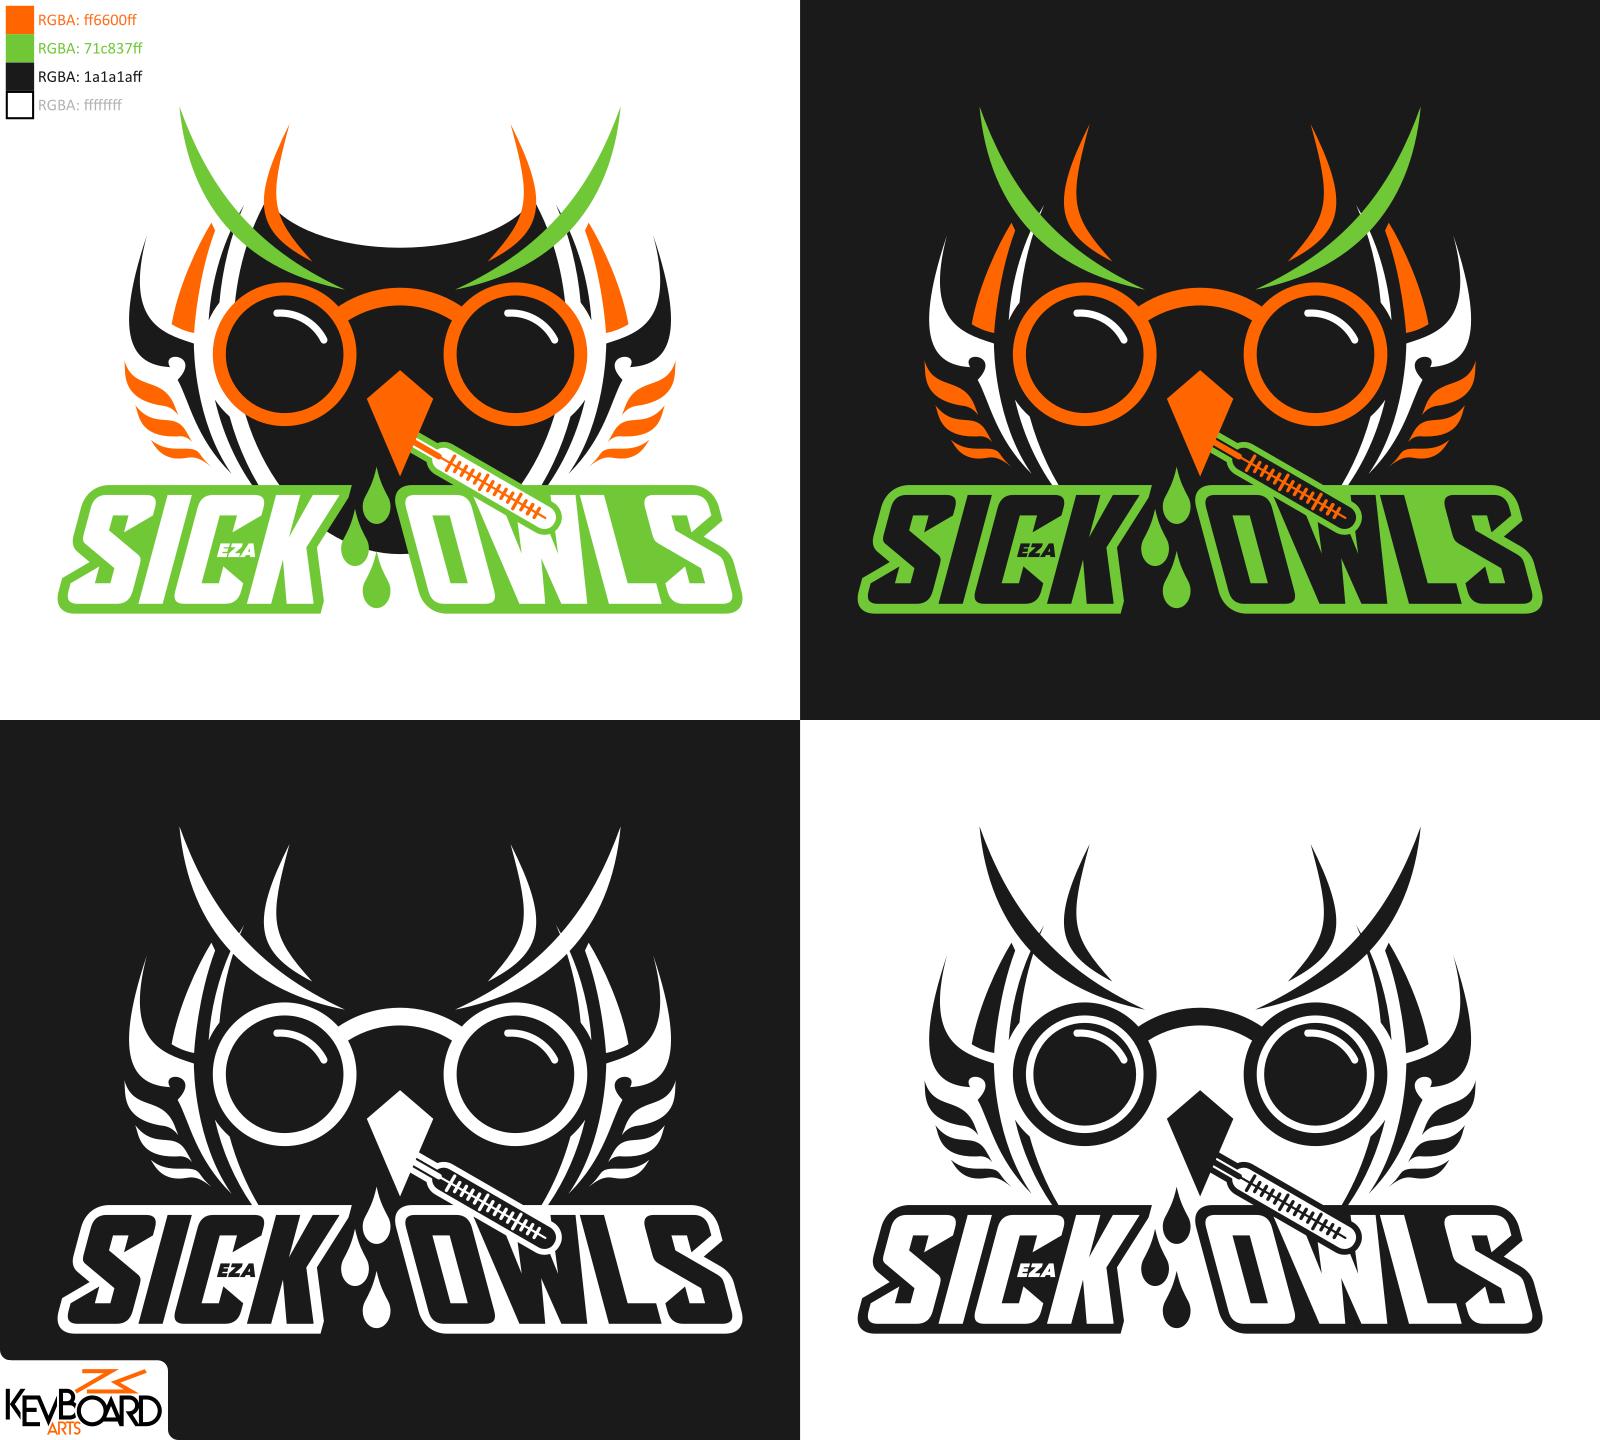 EZA-Prodcast Season 5 Logo // Sick Owls v1